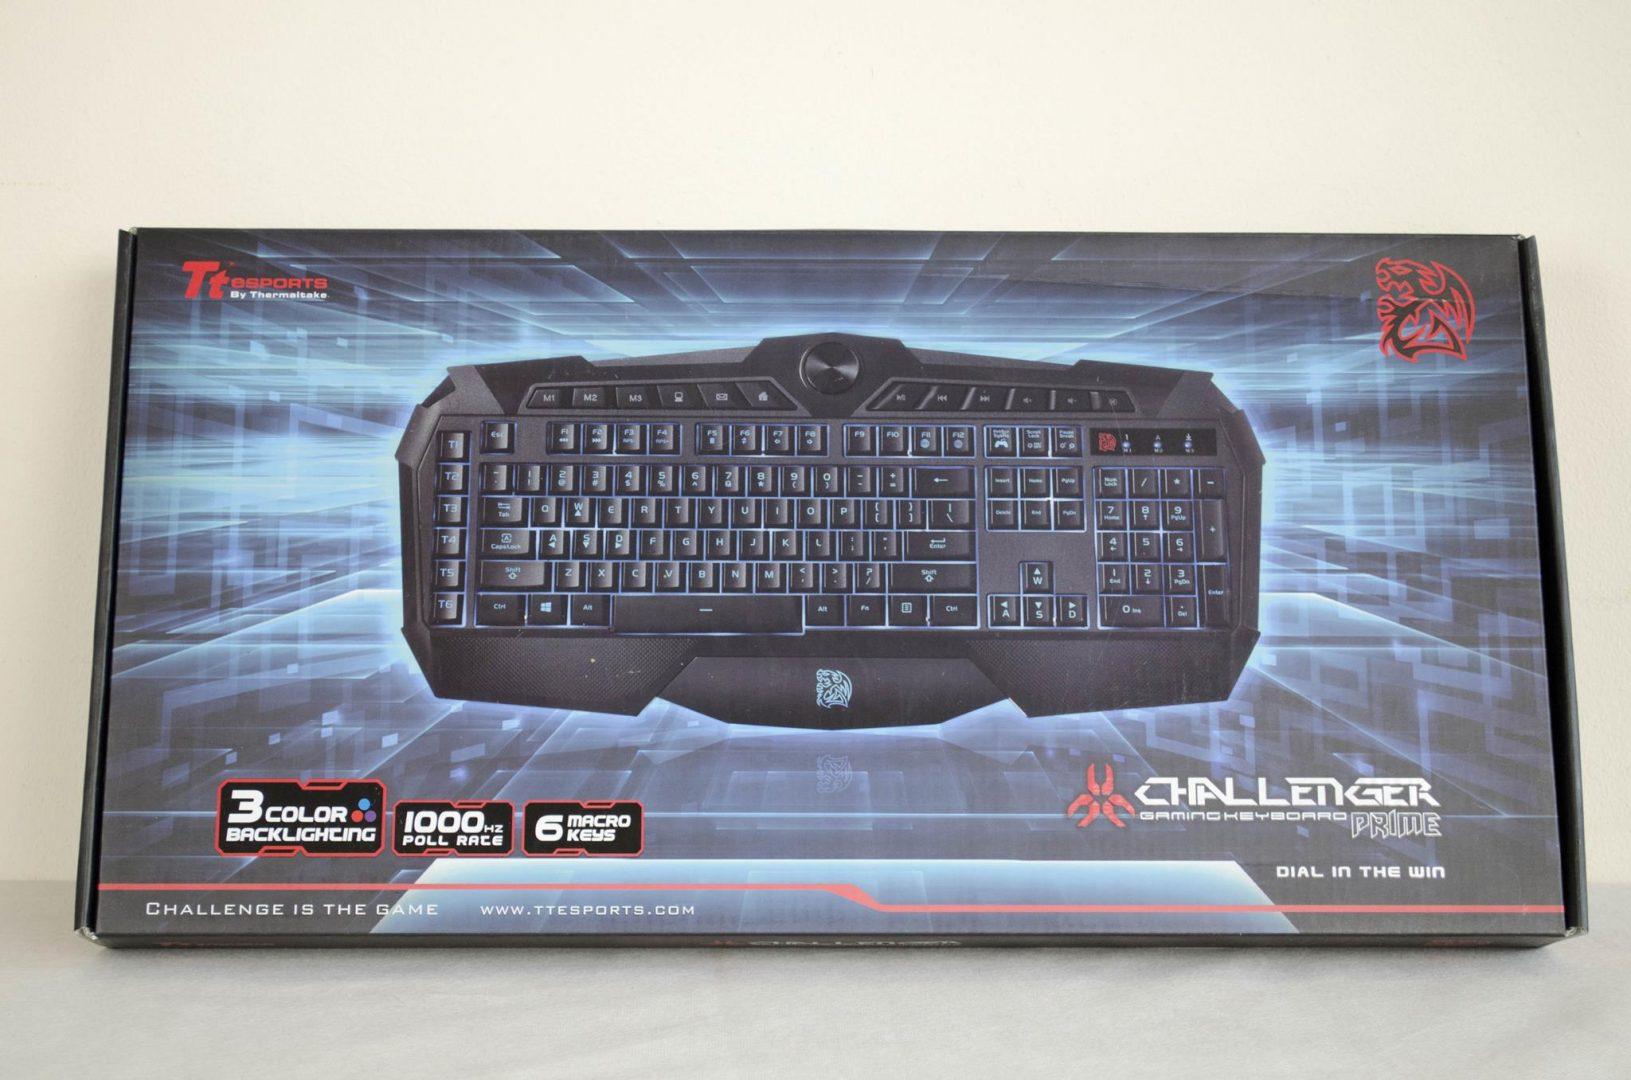 Tt eSPORTS Challenger Prime Gaming Keyboard